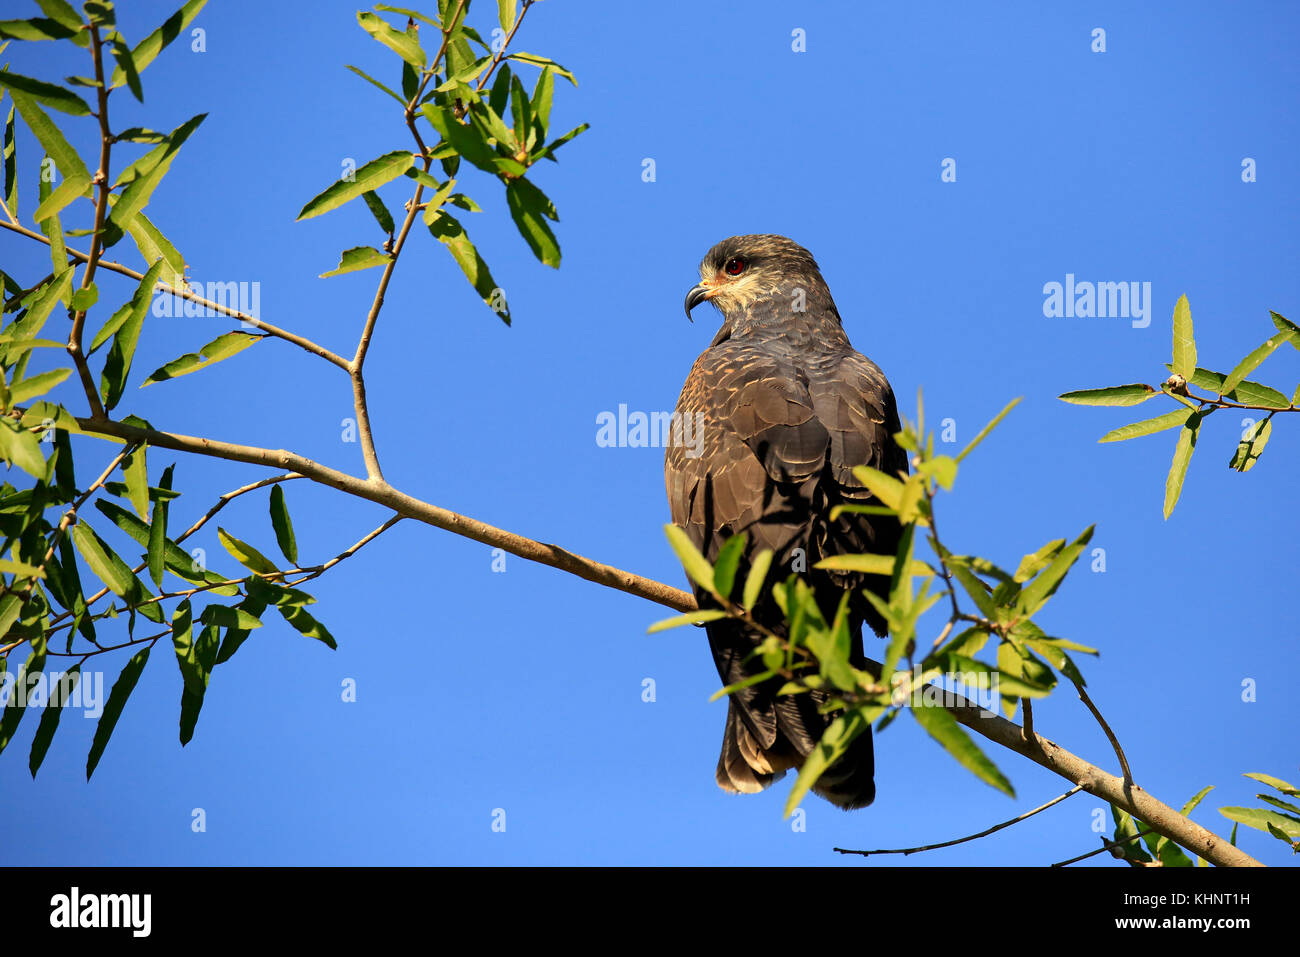 Snail Kite in Profile, on a Branch. Rio Claro, Pantanal, Brazil - Stock Image